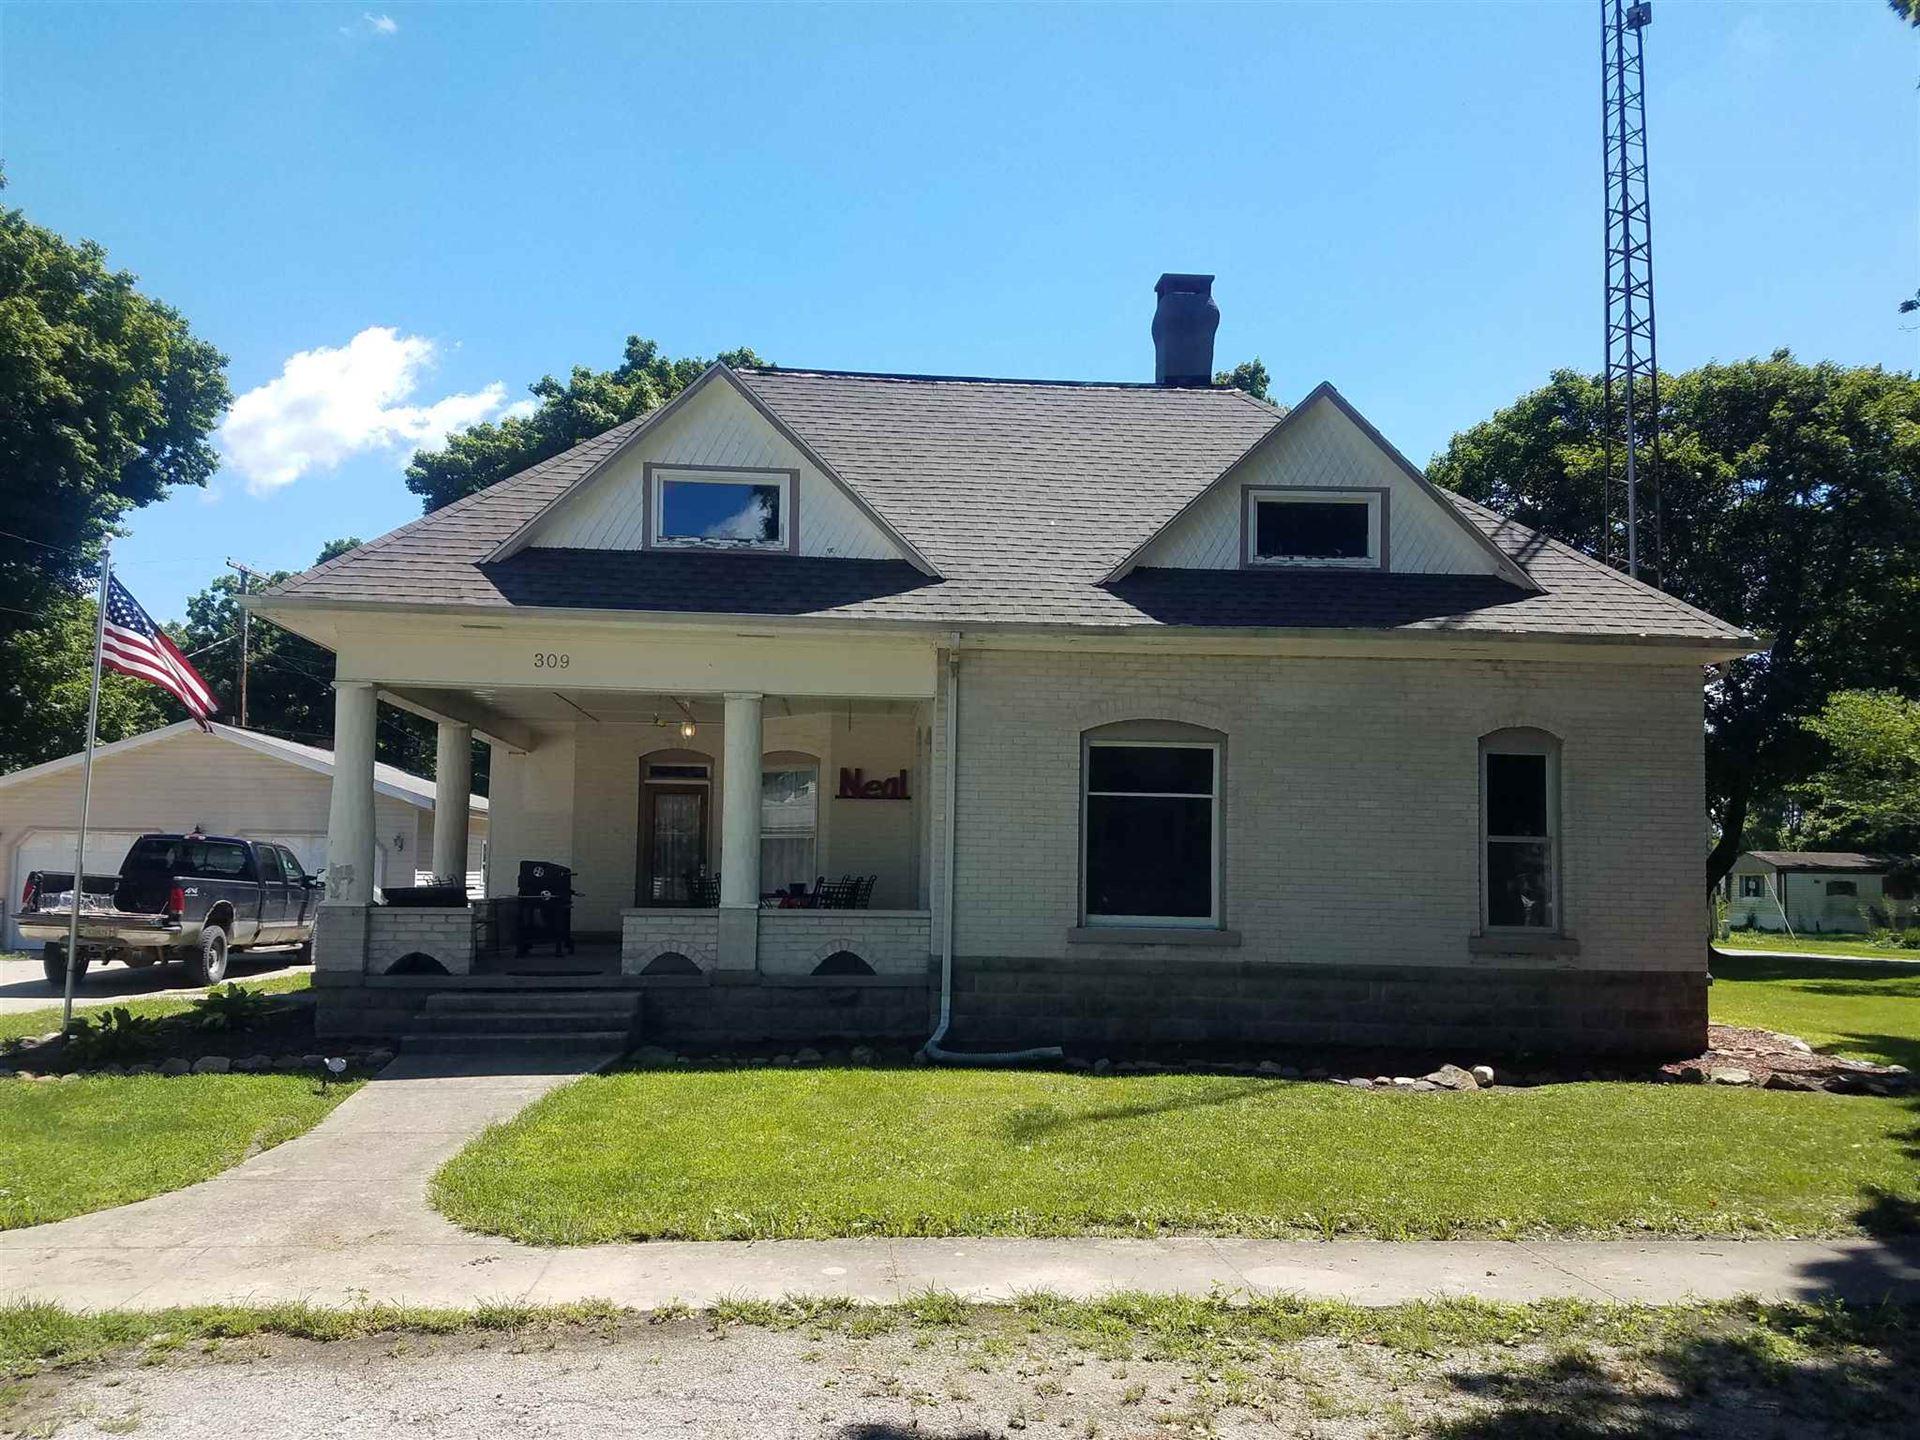 309 S Toner Street, Kewanna, IN 46939 - #: 202029532